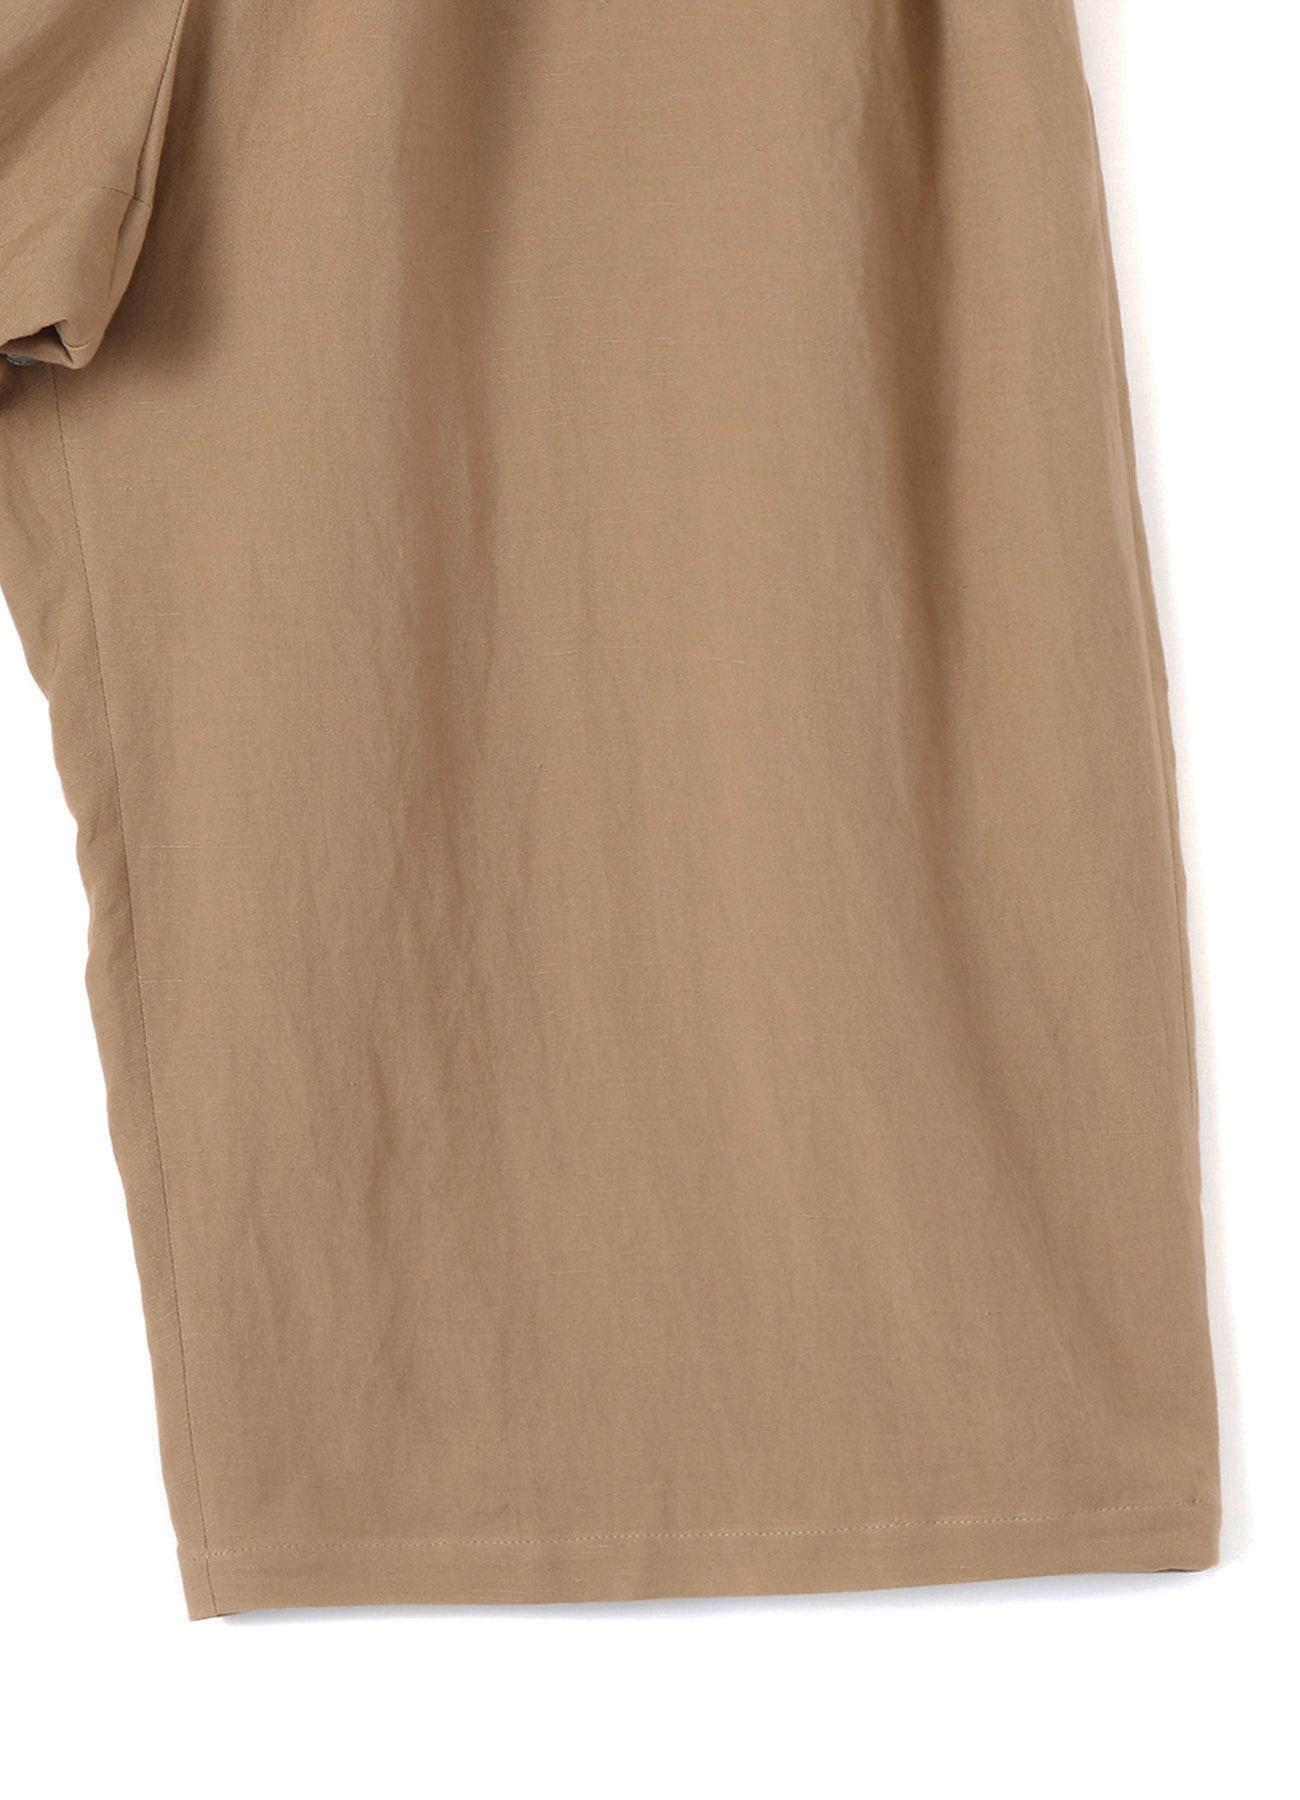 Ry/Li Easy Cross Indian Layer One Tack 6-quarter-length Wrap Pants